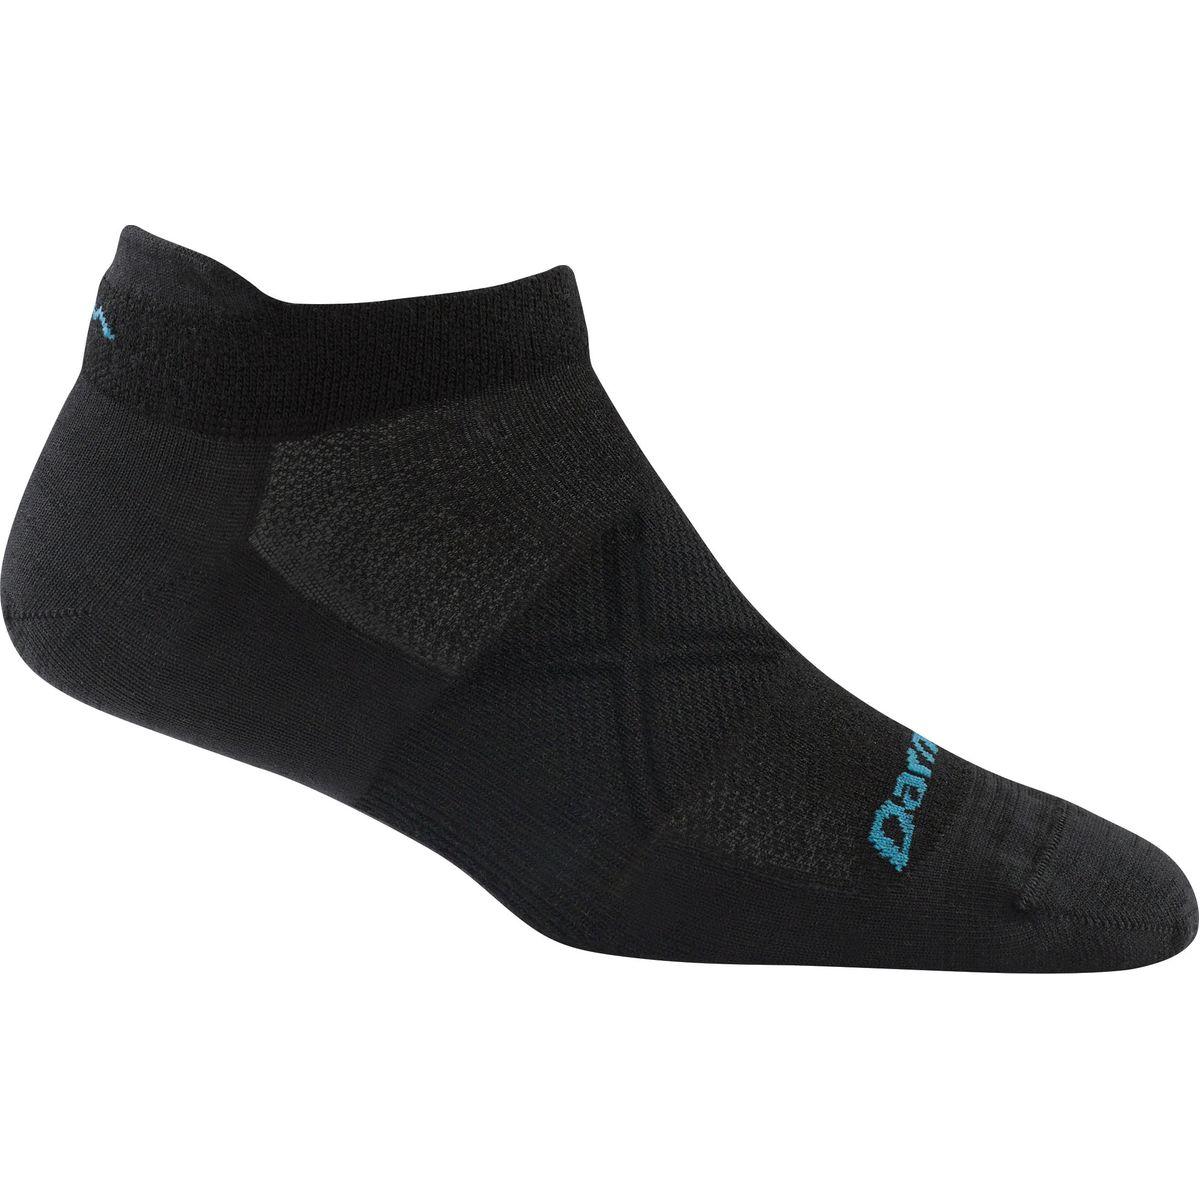 photo: Darn Tough Coolmax Vertex No Show Tab Ultra-Light Cushion running sock